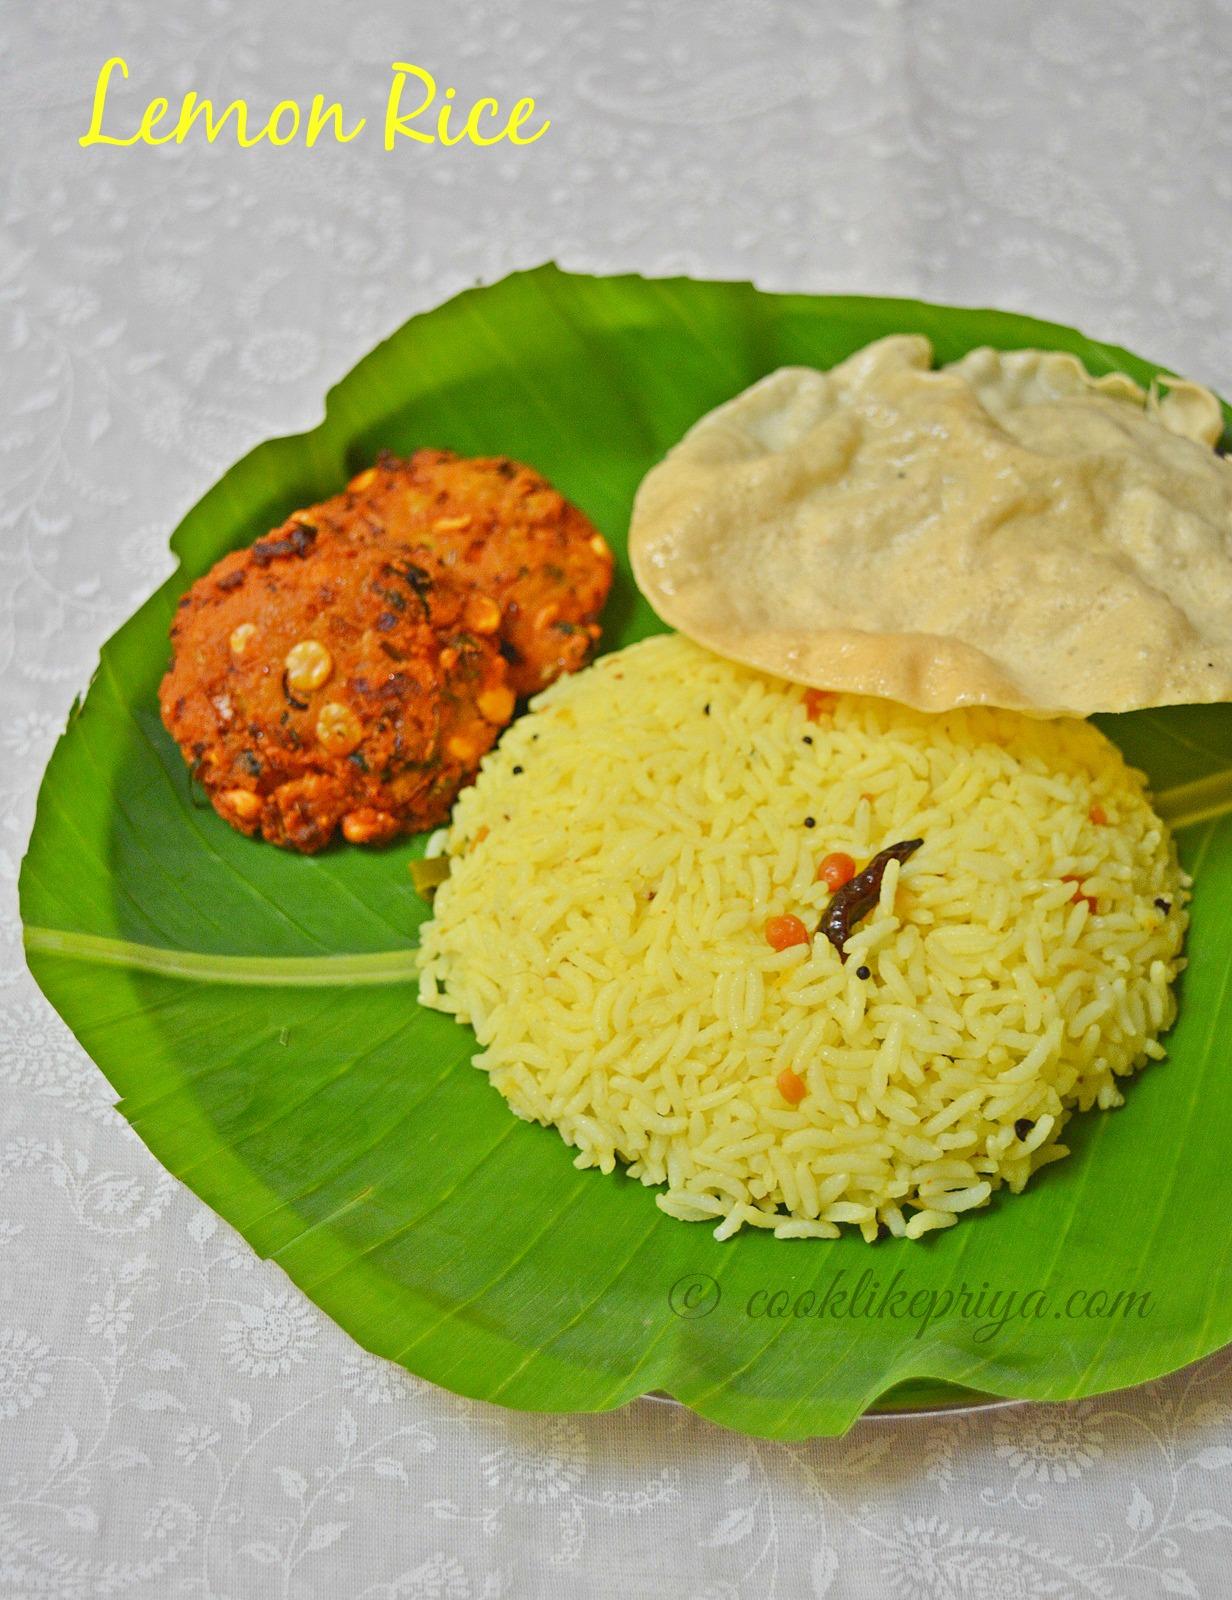 Lemon Rice | South Indian Lunch Box recipe